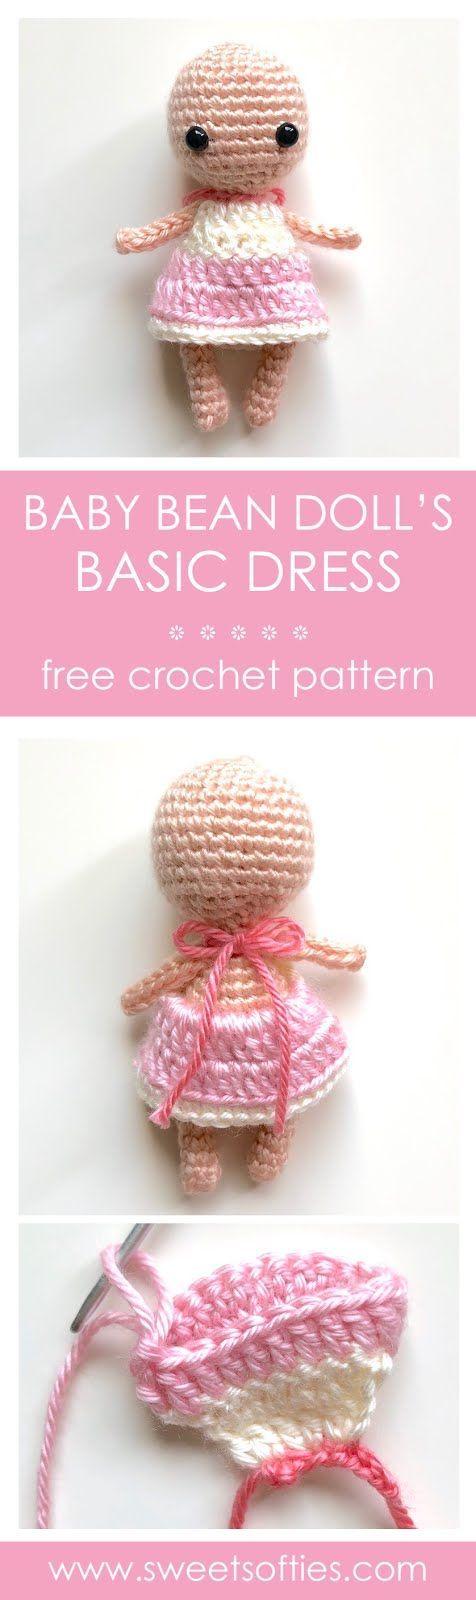 Free amigurumi crochet pattern: Basic Dress for Baby Bean Doll Base #sweetsofties #yarn #art #craft #crochet #diy #tutorial #pattern #free #cute #beginner #beginners #gift #crochetideas #easy #amigurumi #gift #crochetdoll #amigurumidoll #doll #toy #girl #boy #play #mini #miniature #handmade #freecrochetpattern #freeamigurumipattern #clothing #dress #dollclothes